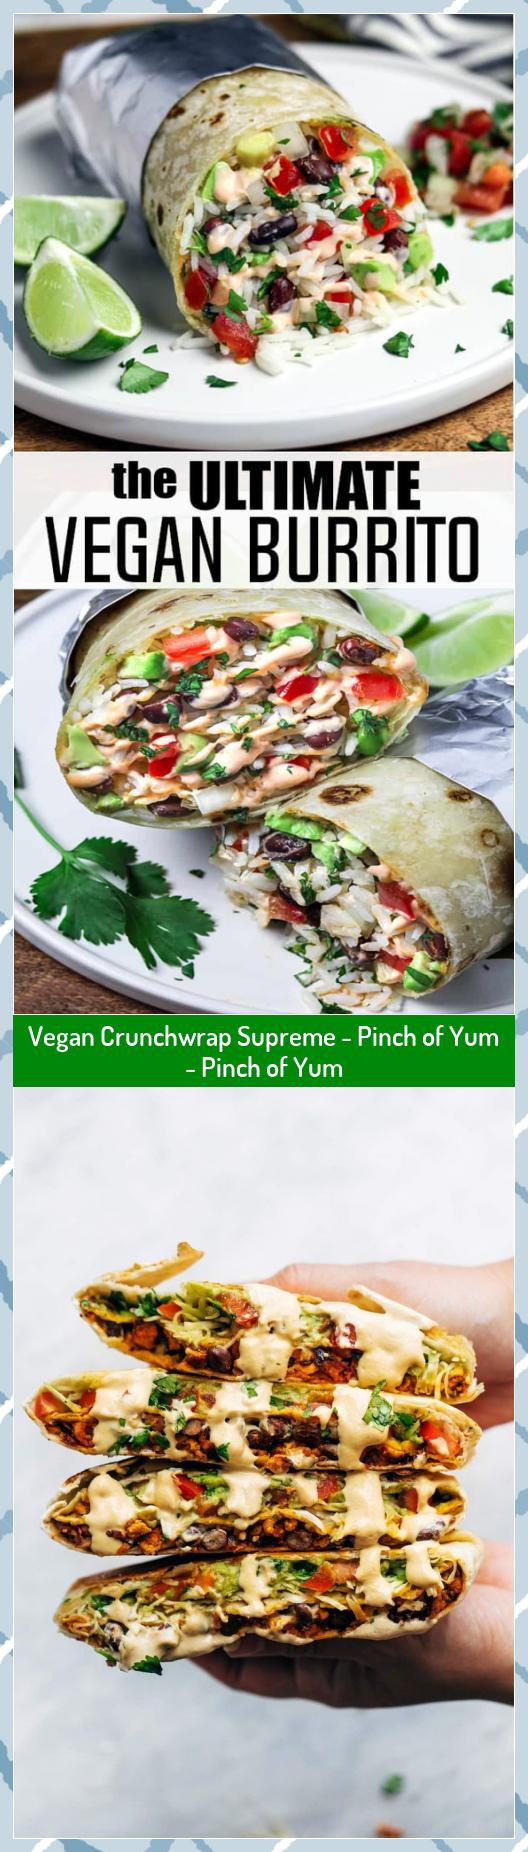 Vegan Crunchwrap Supreme - Pinch of Yum - Pinch of Yum #Crunchwrap #Pinch #Supreme #Vegan #Yum